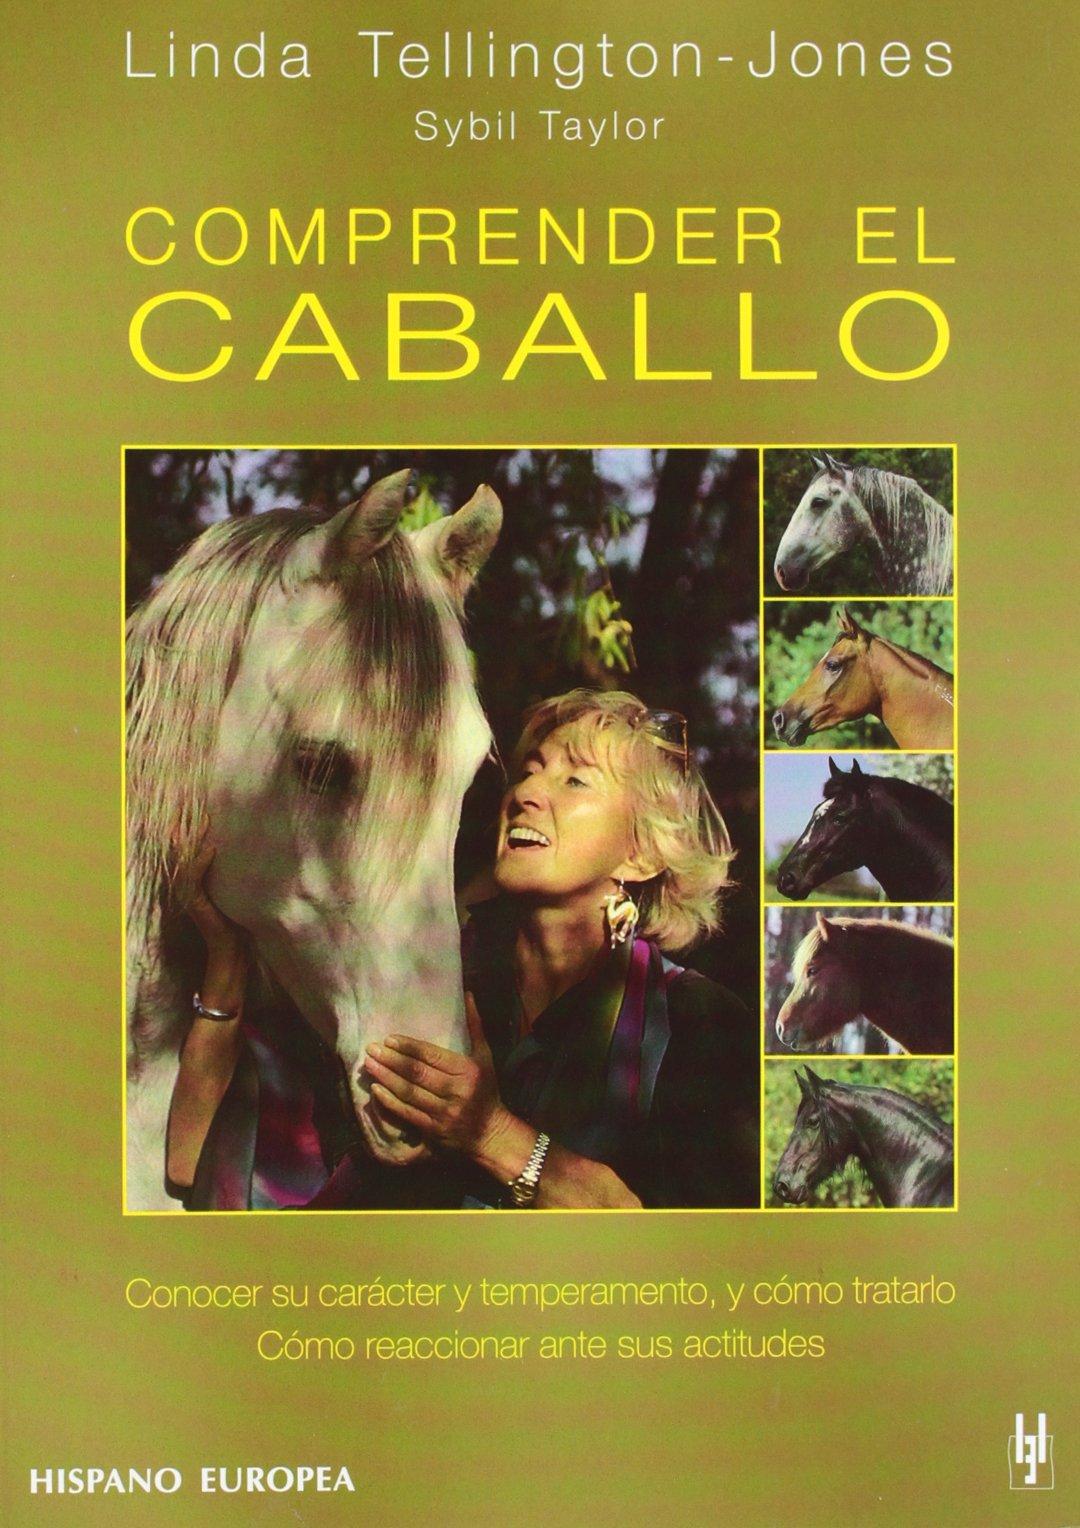 Comprender el caballo (Herakles) Tapa blanda – 2010 Linda Tellington-Jones Sybil Taylor Editorial Hispano Europea S.A.